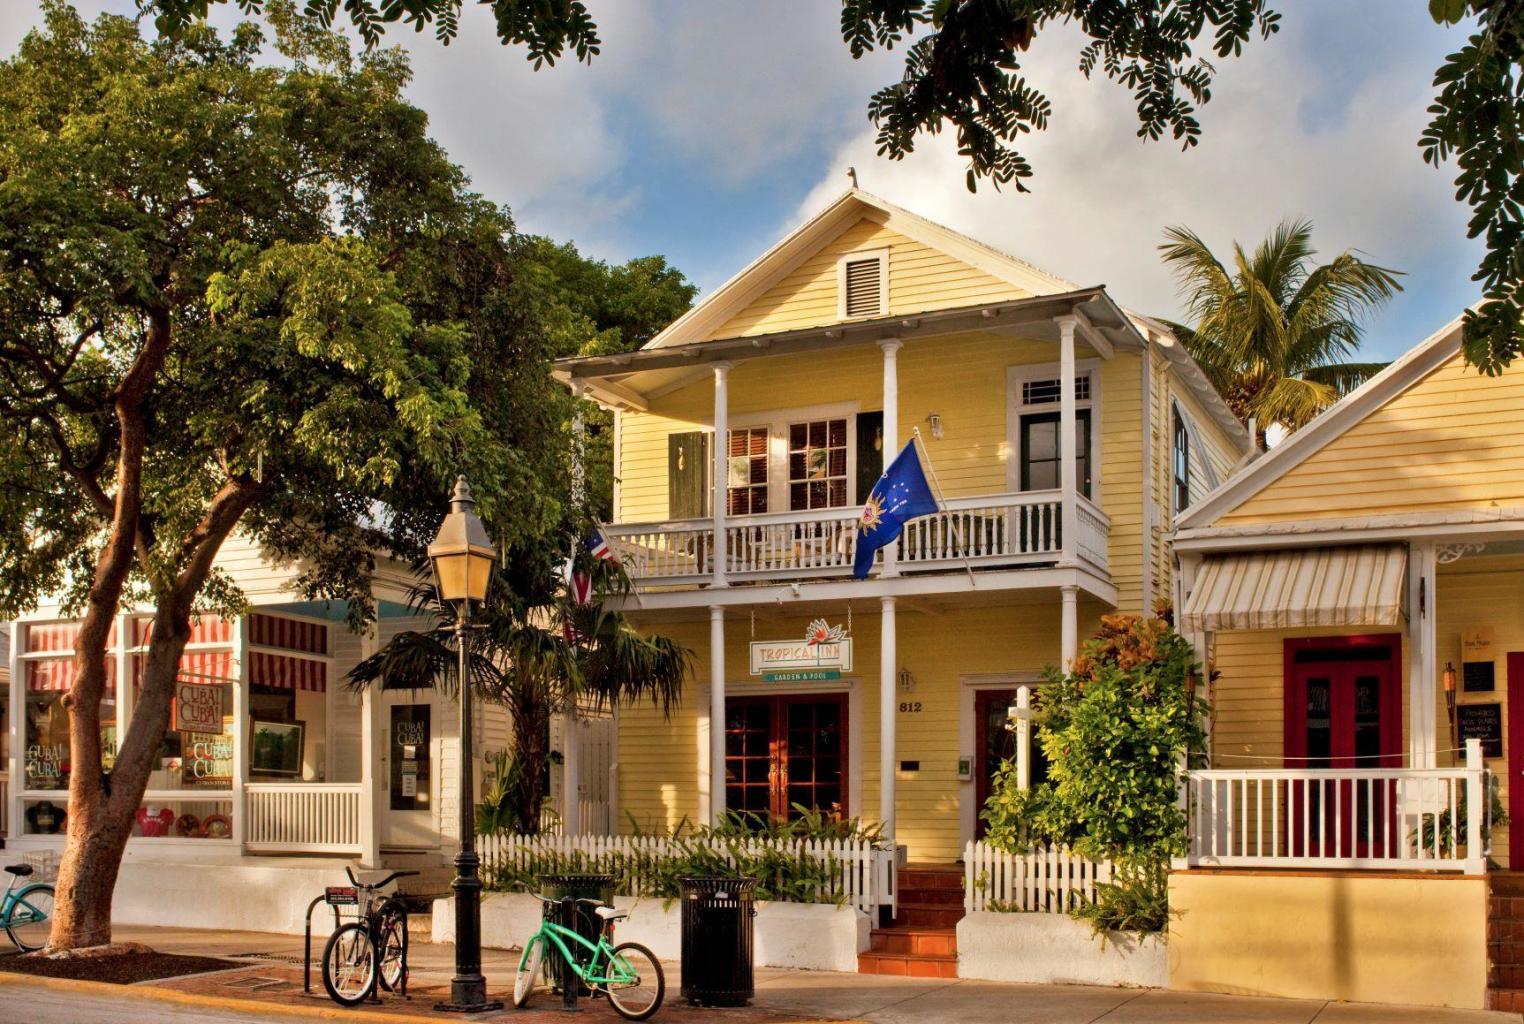 Pleasing 812 Duval Street Truman Co Real Estate Interior Design Ideas Tzicisoteloinfo